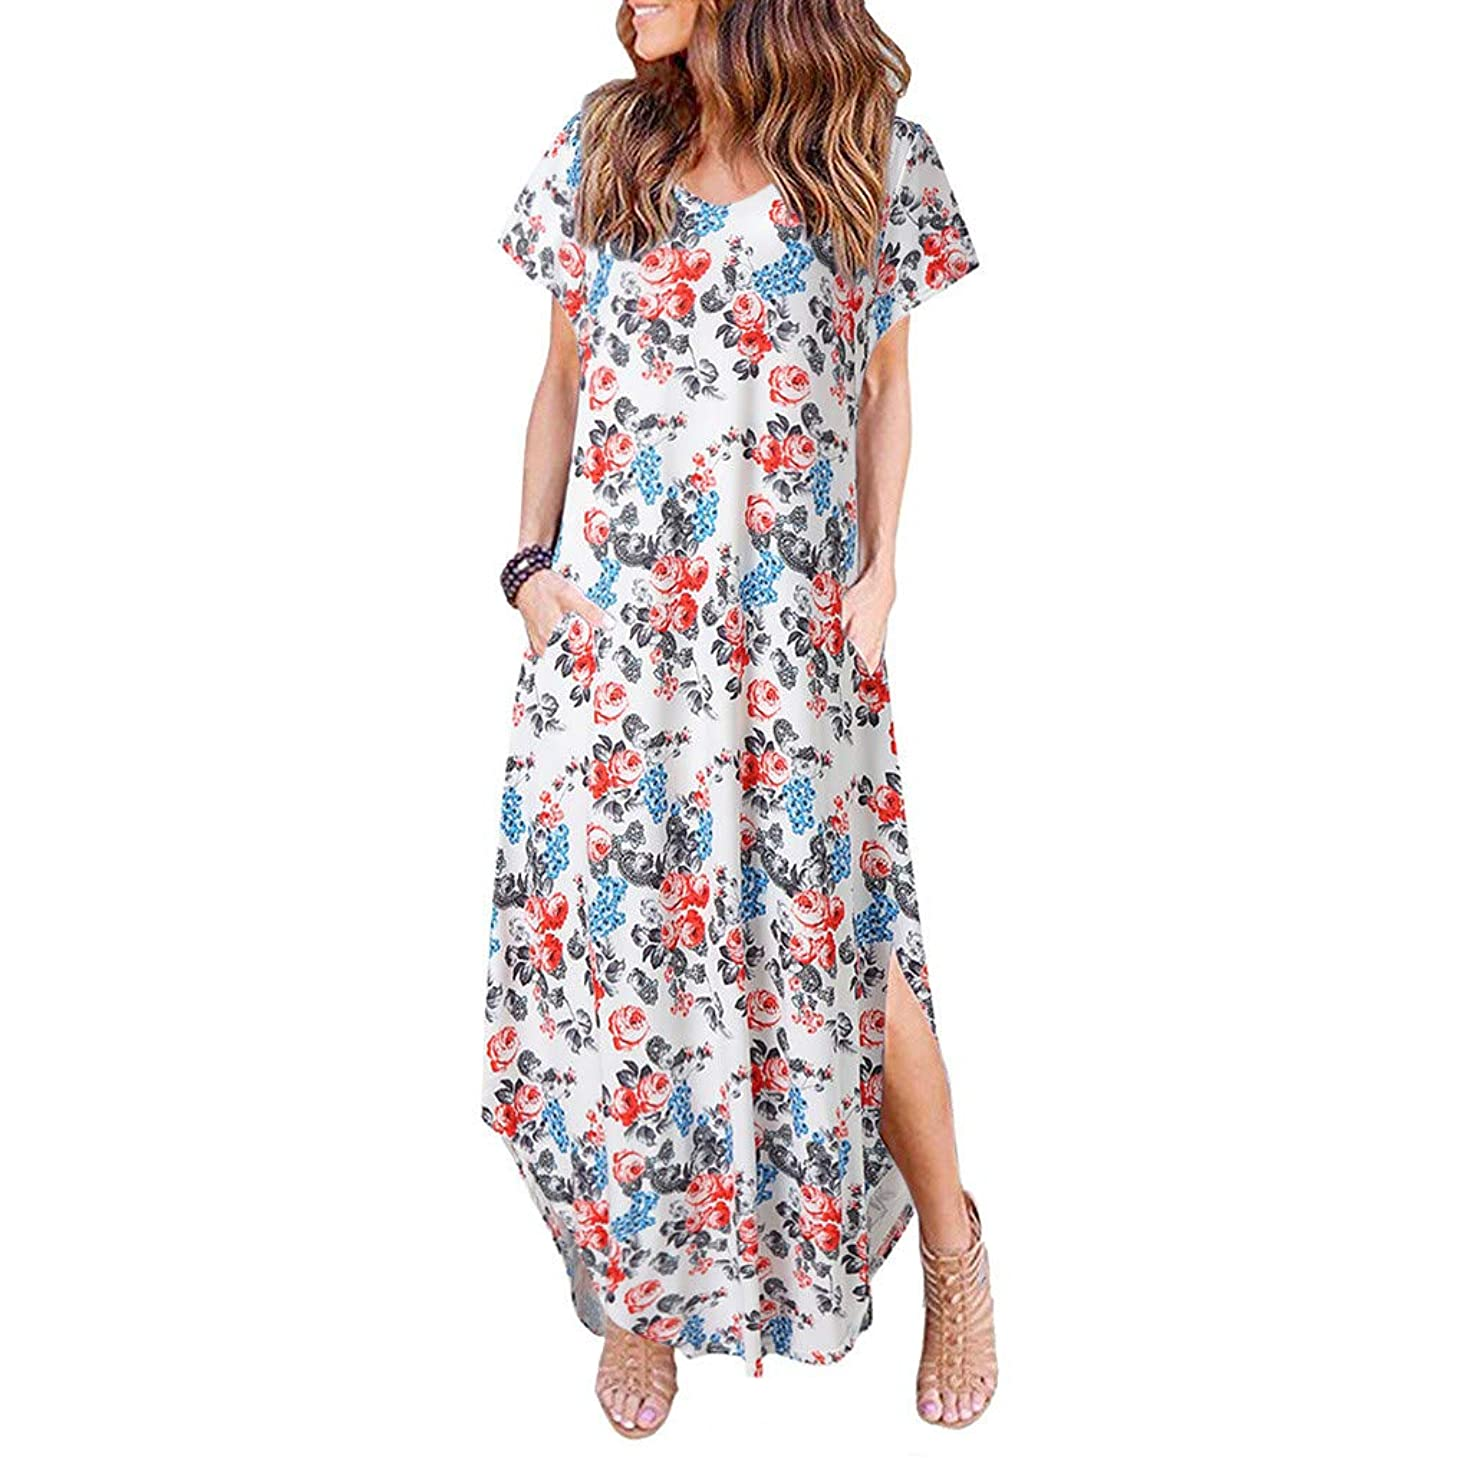 Women Short Sleeve Floral Print Crew Neck Split Casual T-Shirt Dress with Pockets